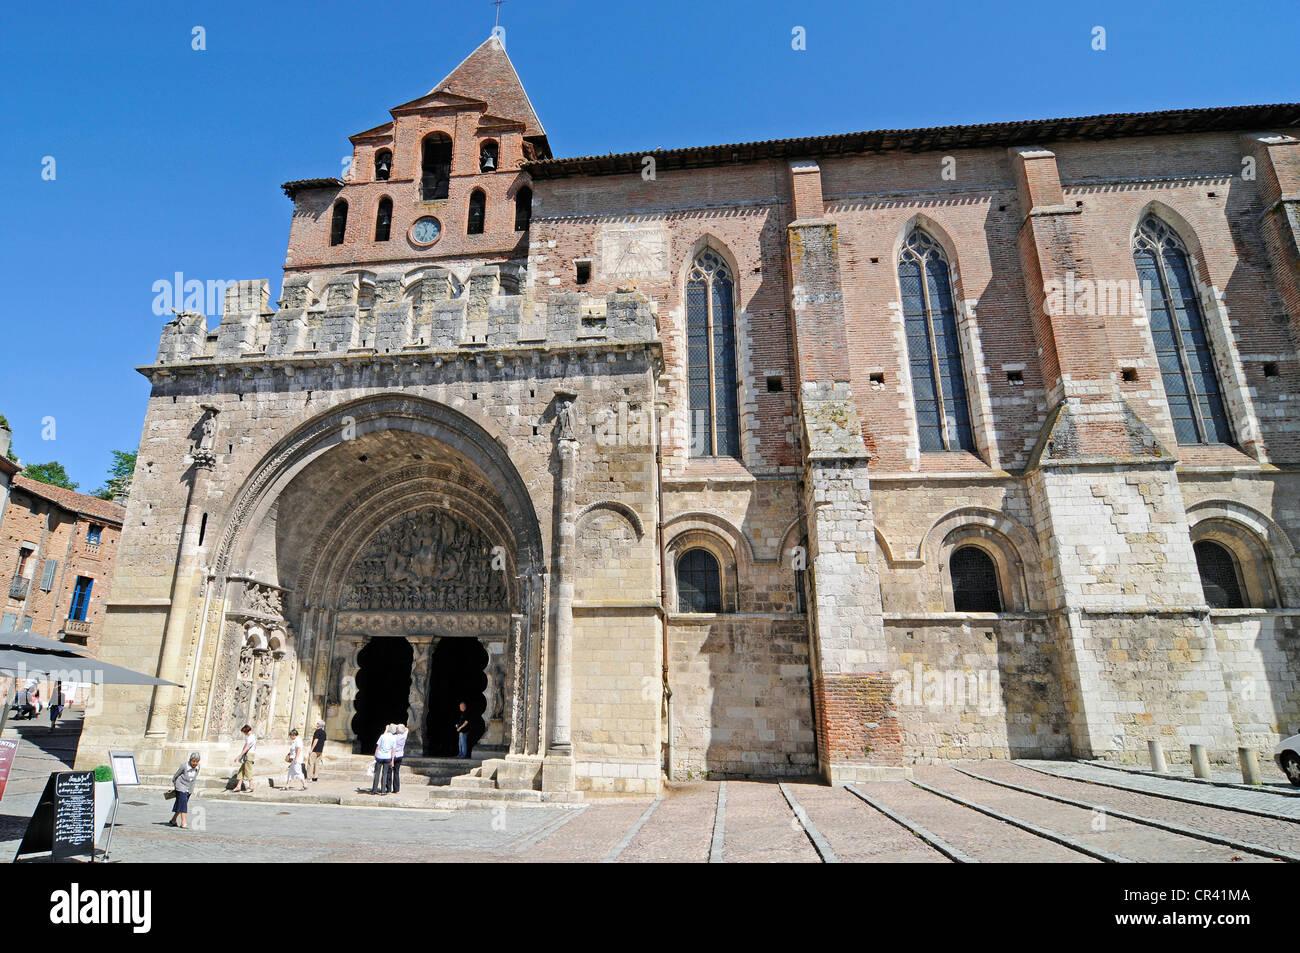 Abbaye Saint-Pierre de Moissac abbey church, Via Podiensis or Chemin de St-Jacques or French Way of St. James - Stock Image